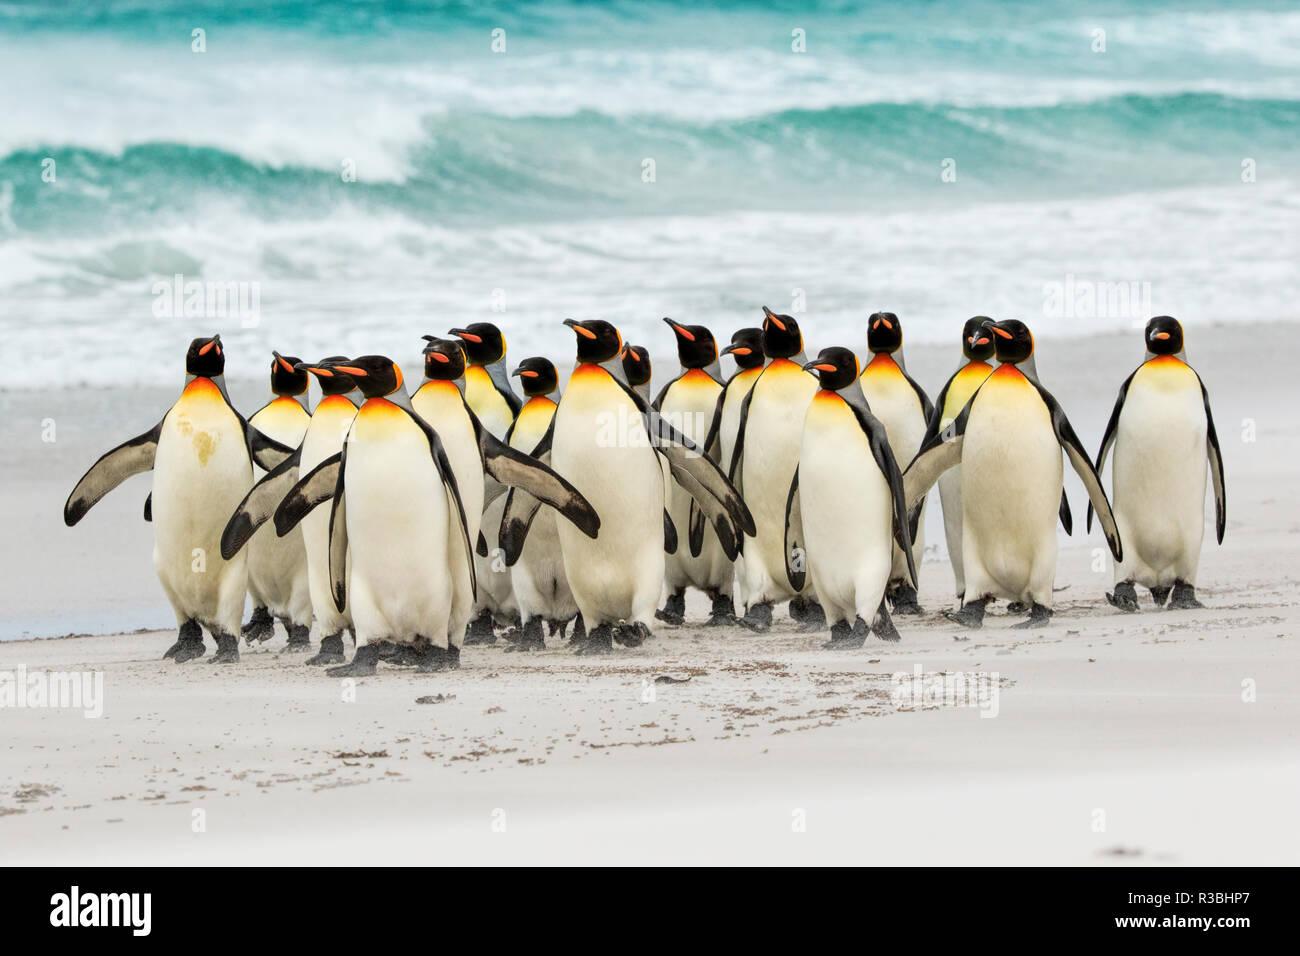 Gruppe von König Pinguine am Strand, Volunteer Point, East Island, Falkland Inseln, Aptenodytes patagonicus Stockbild